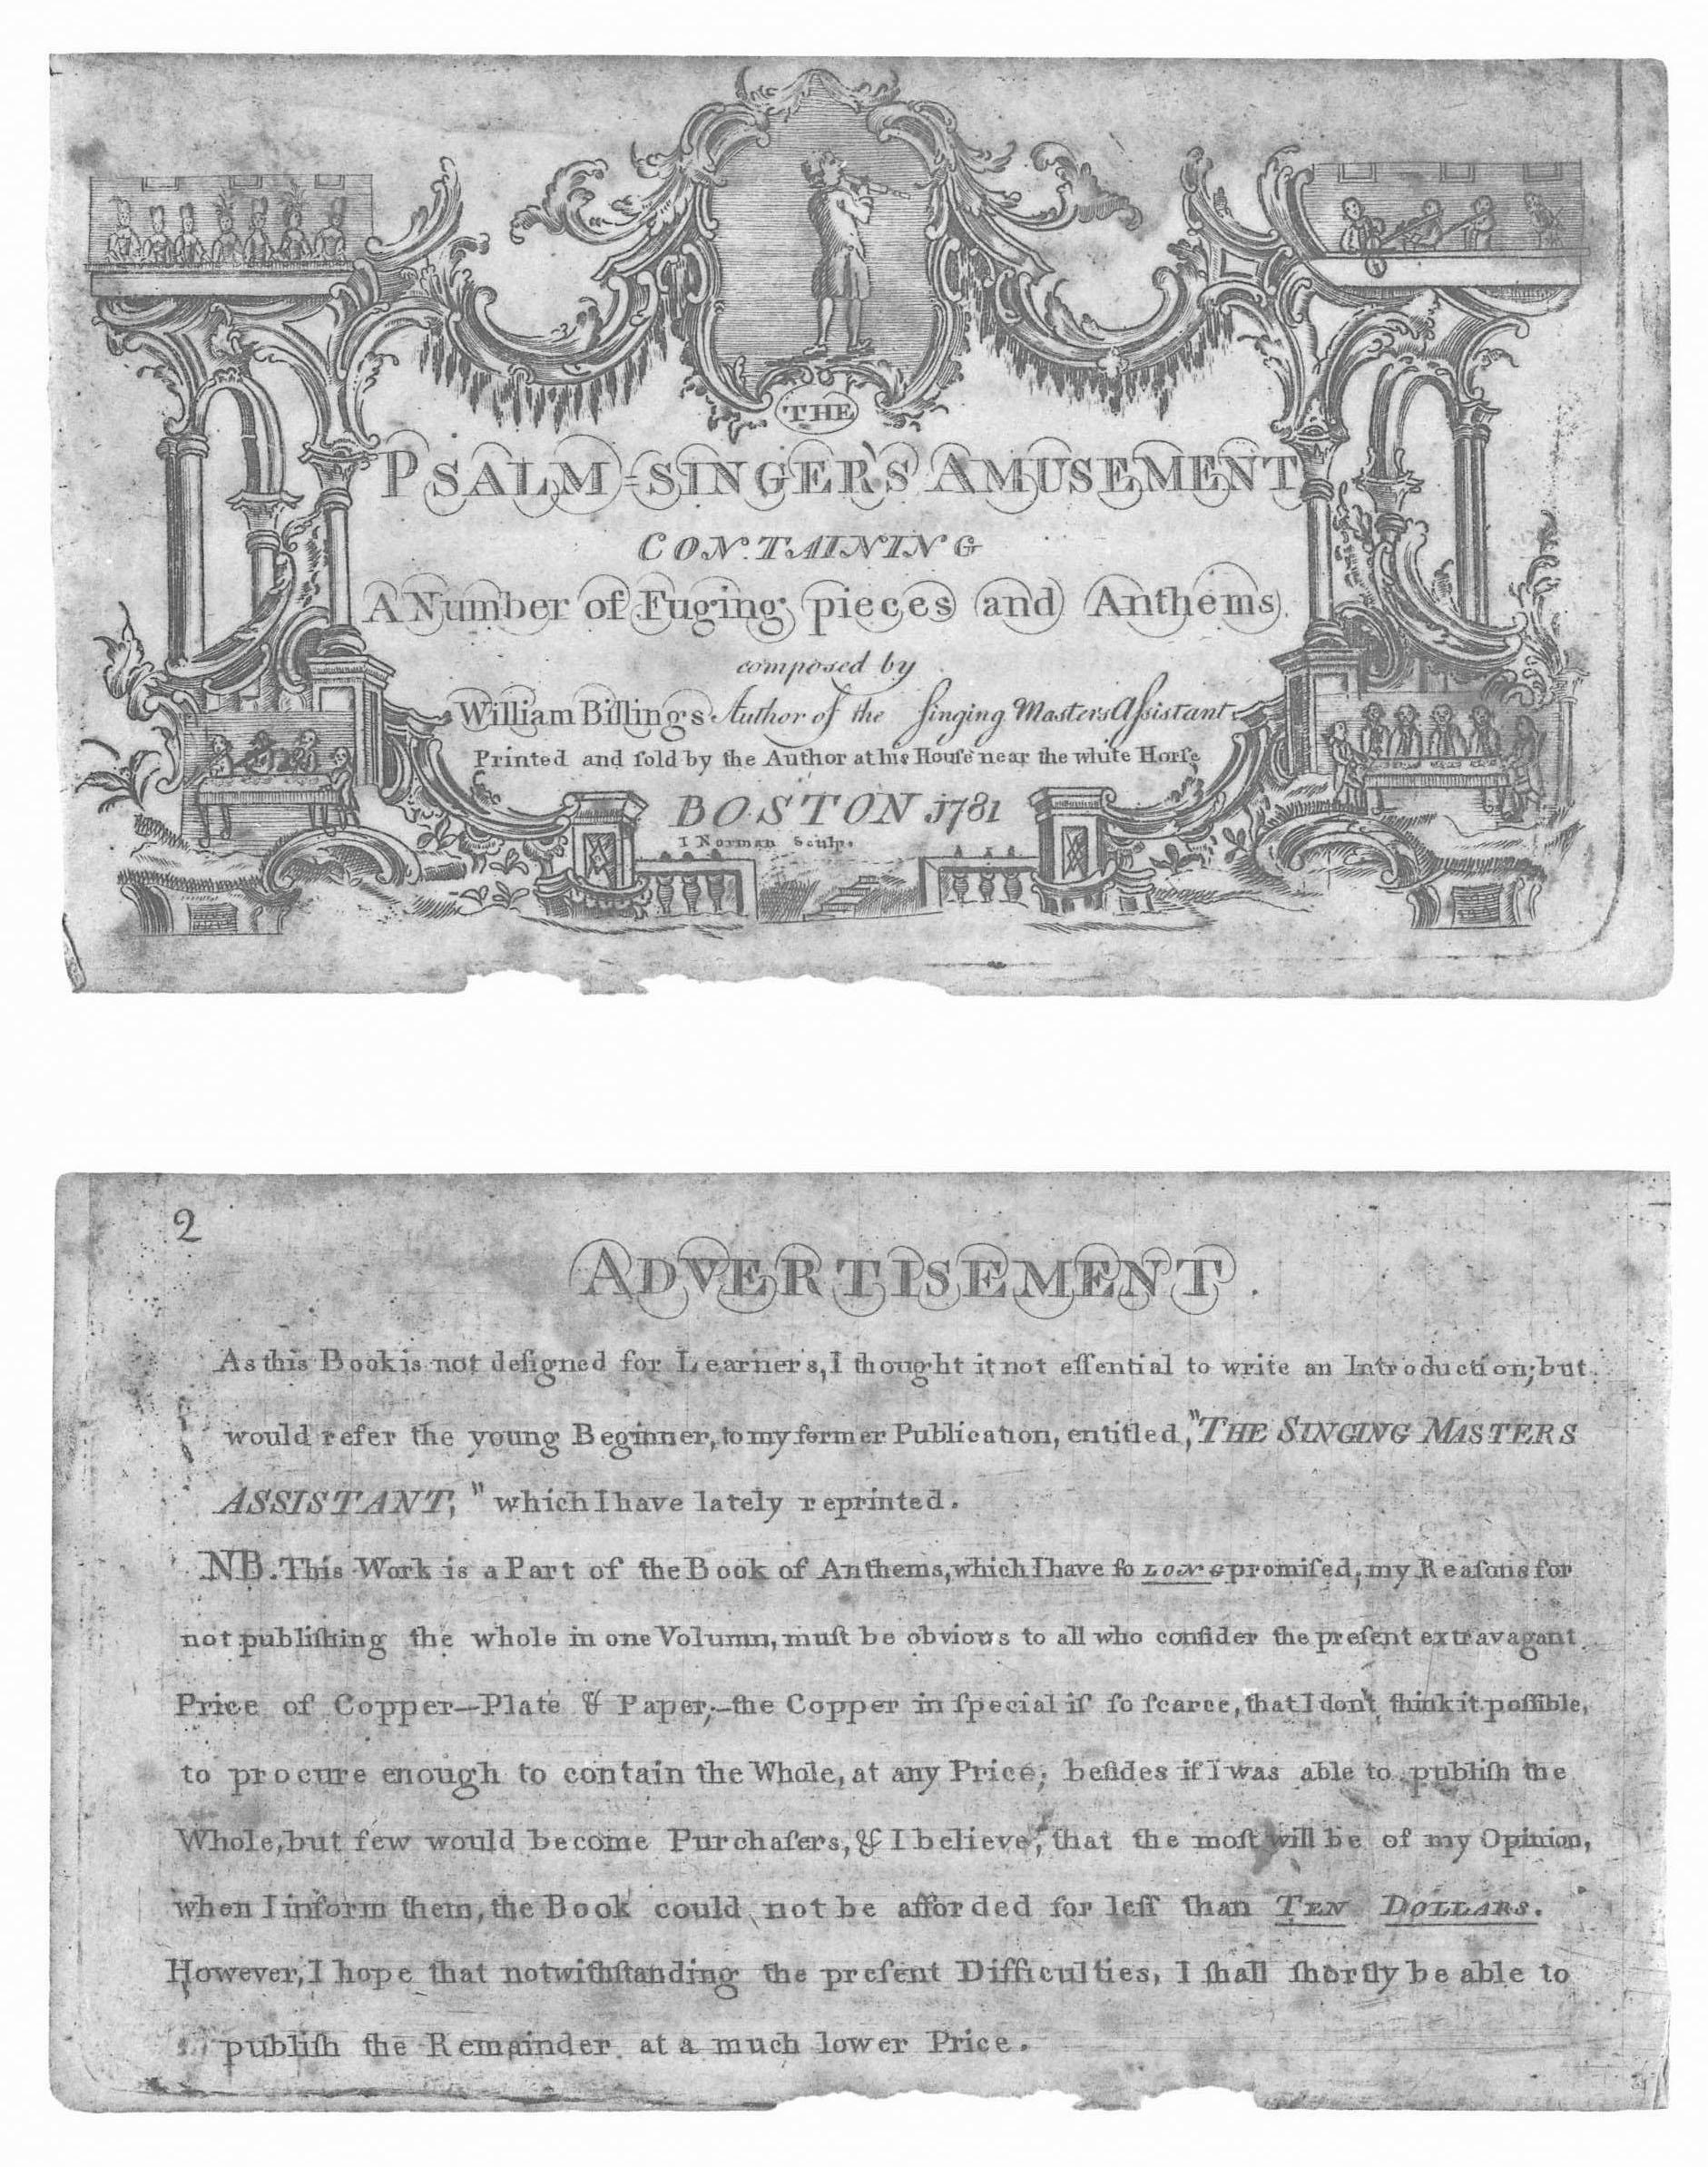 The Psalm-Singer's Amusement - Colonial Society of Massachusetts